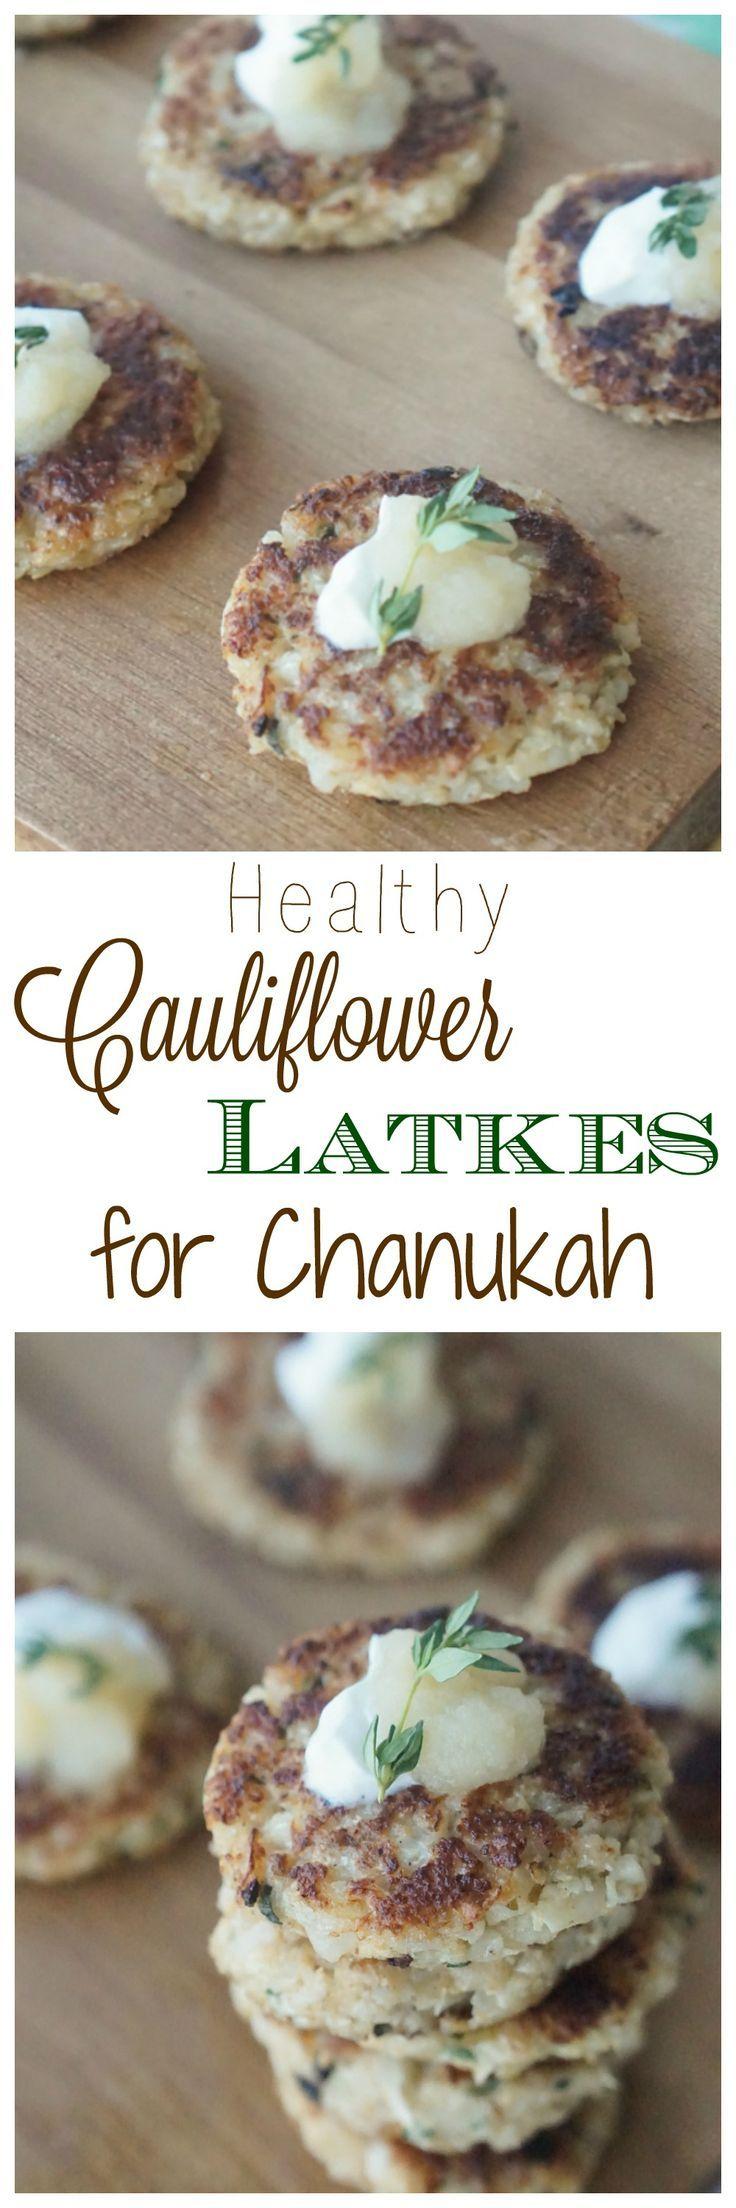 Try my  Healthy Cauliflower Latkes for Chanukah (Paleo, Low Carb, Low Fat Recipe)!